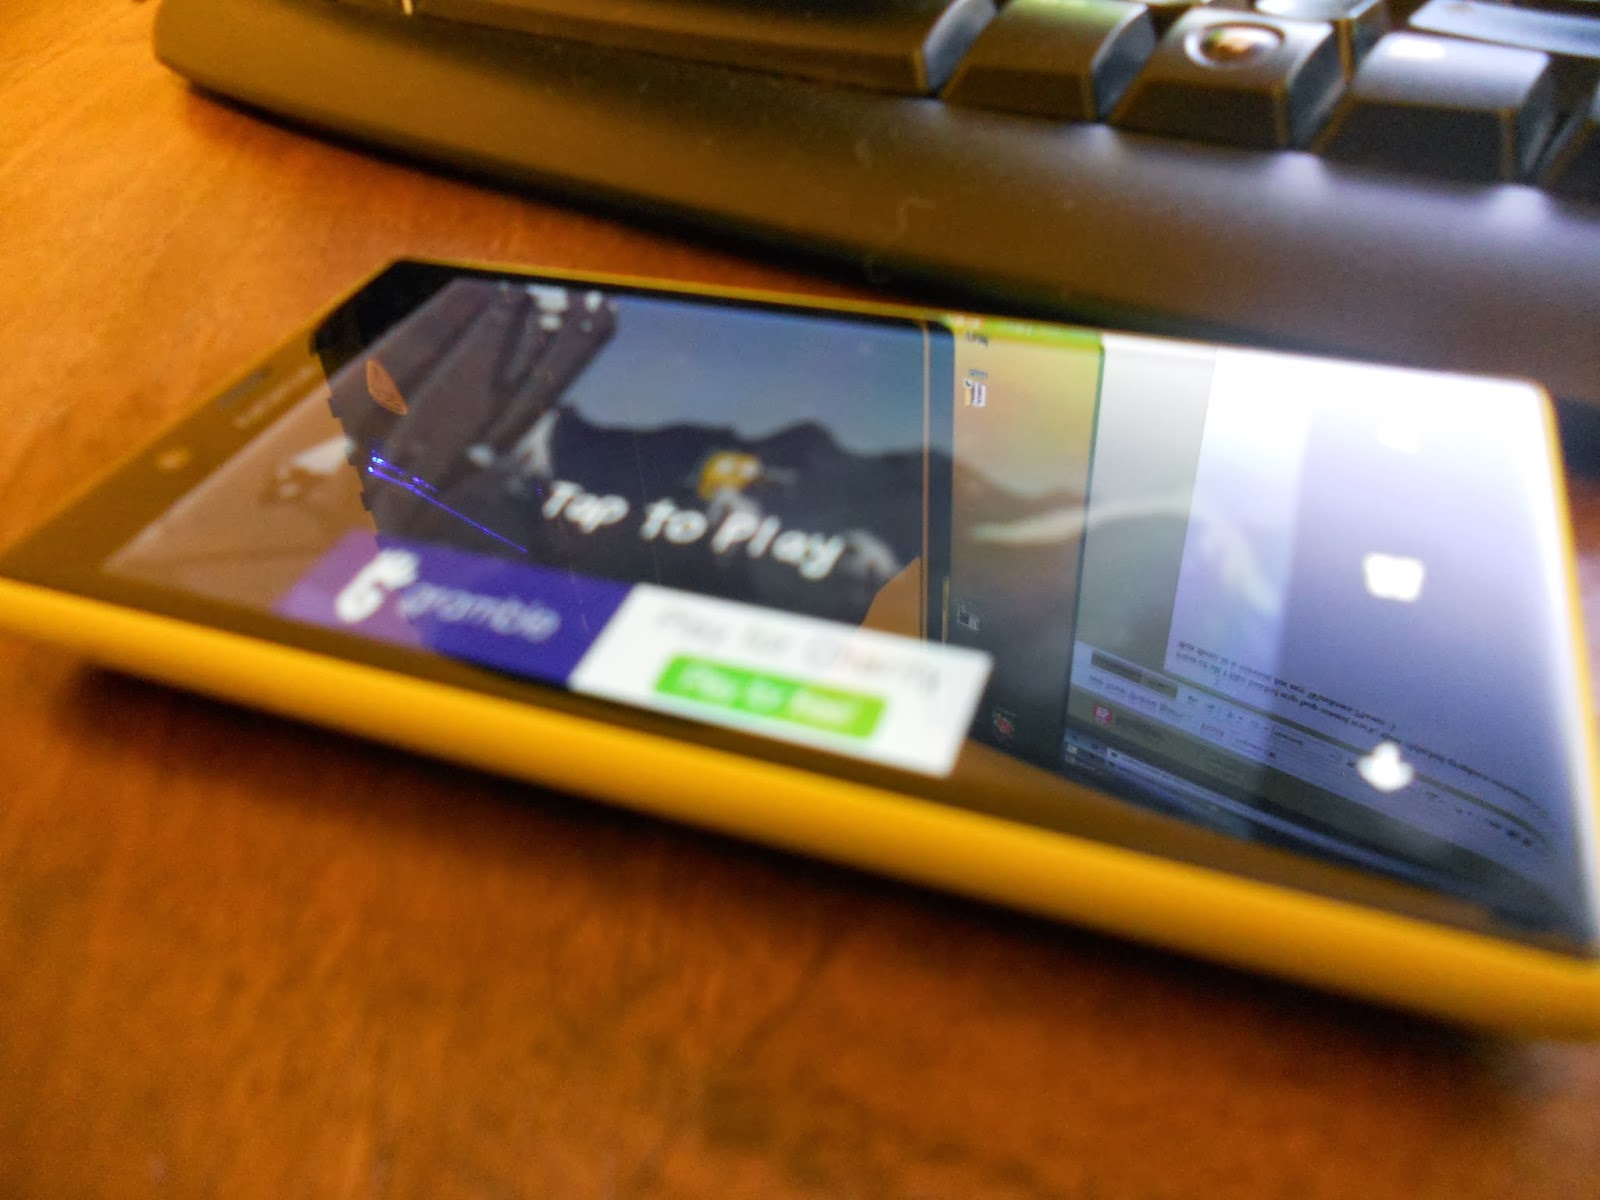 http://www.windowsphone.com/en-us/store/app/square-off/3a3e5ed5-6570-e011-81d2-78e7d1fa76f8